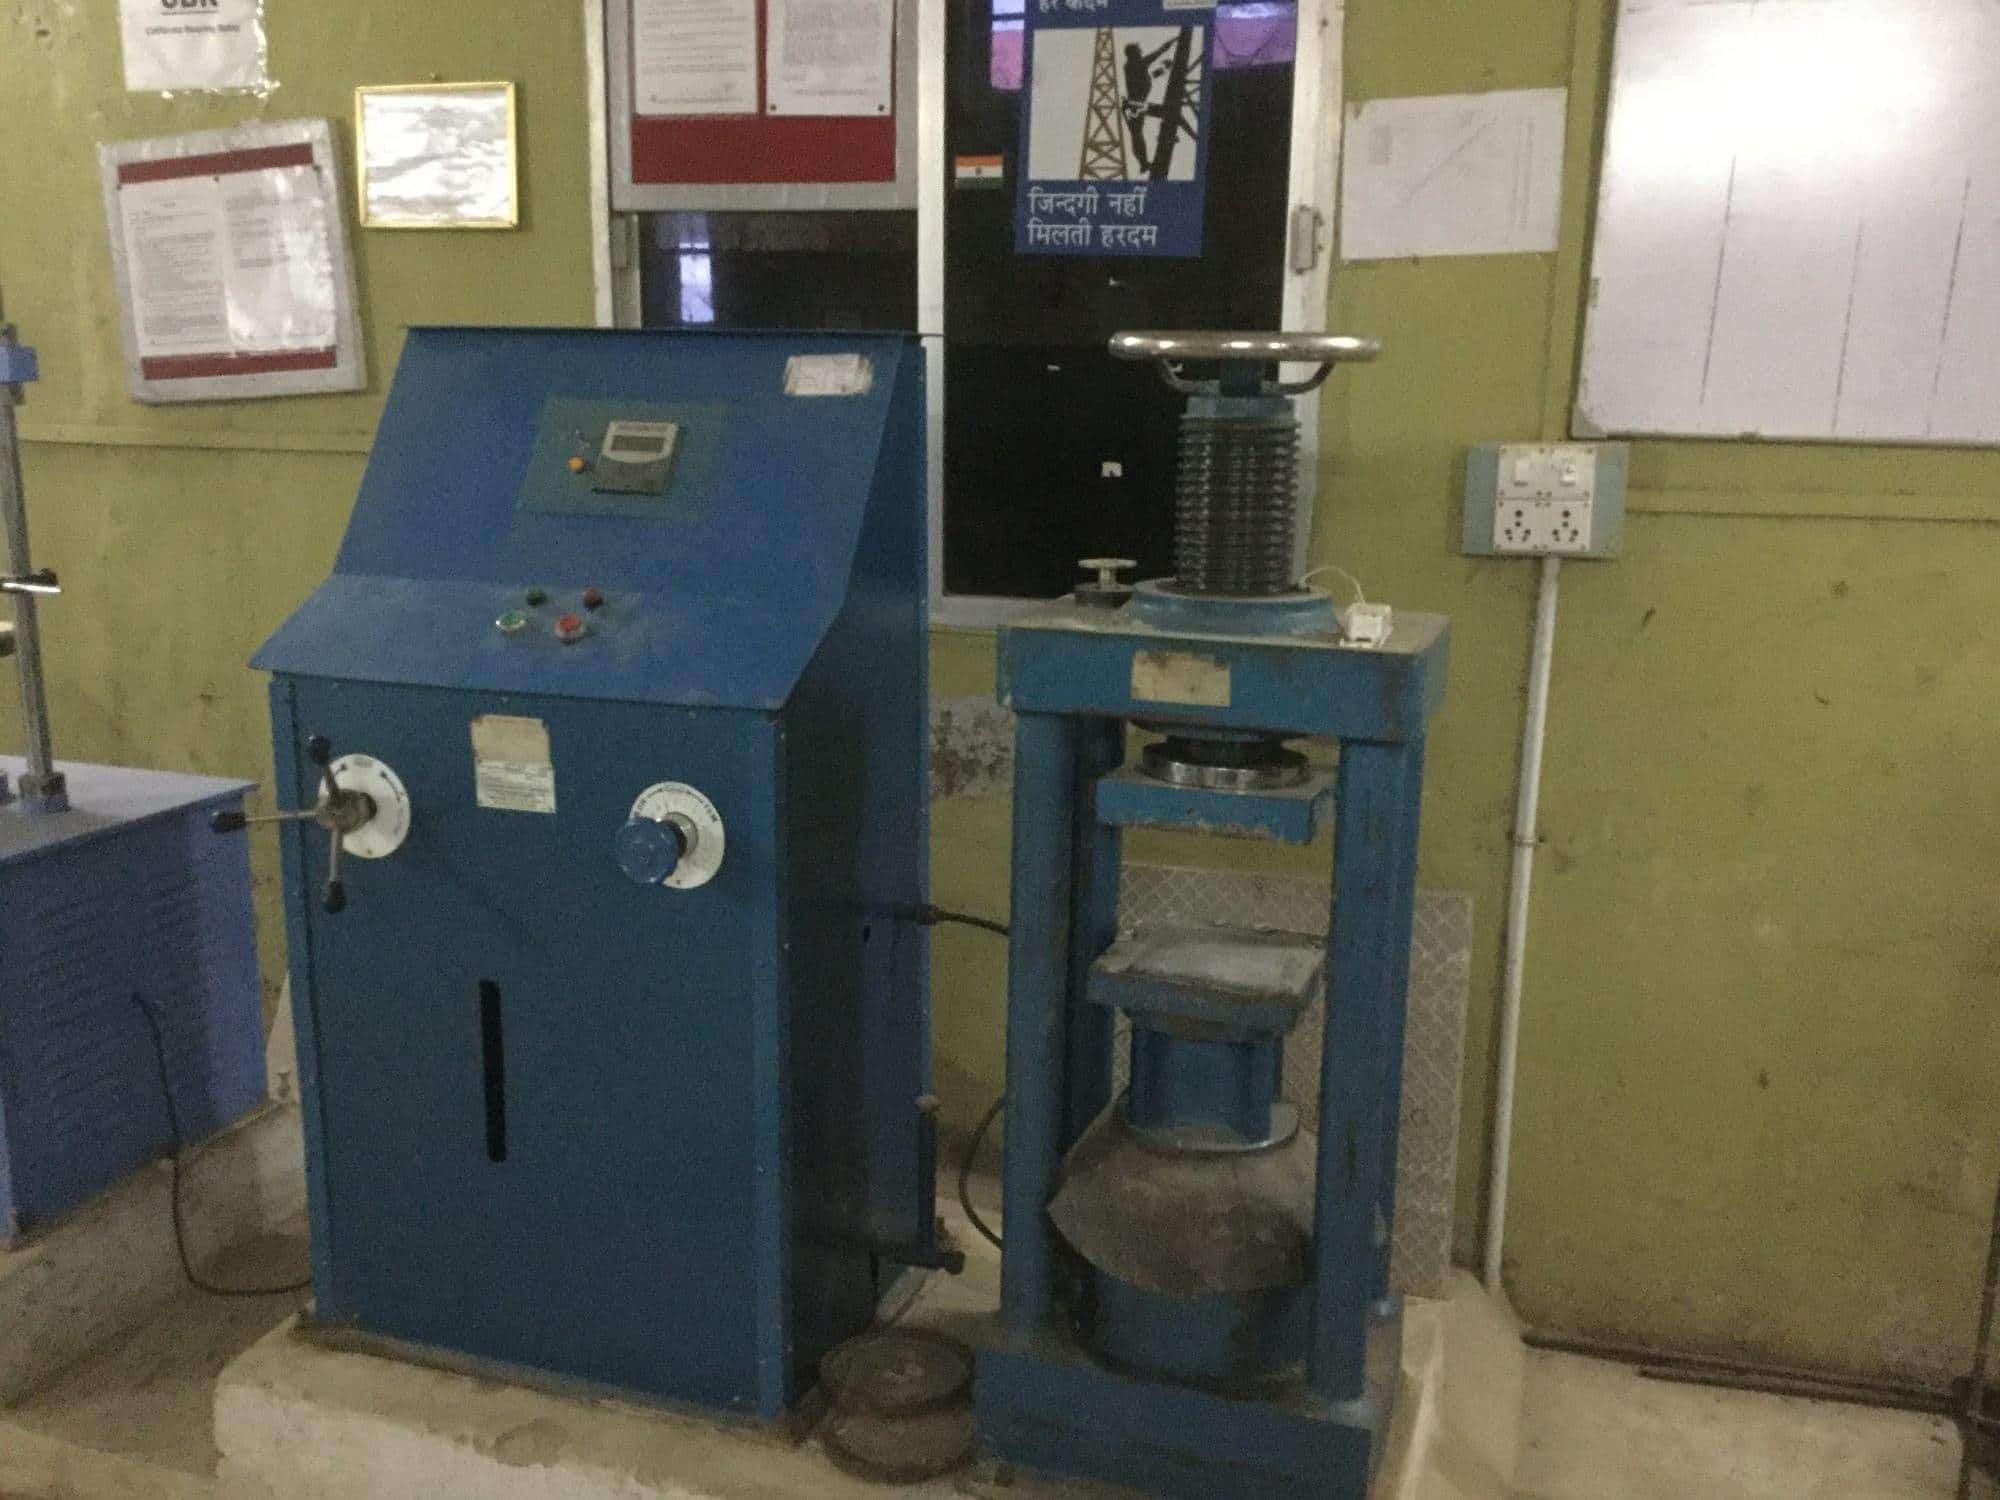 Annoor Test Labs & Engg Services Pvt Ltd, Gannavaram - Laboratory